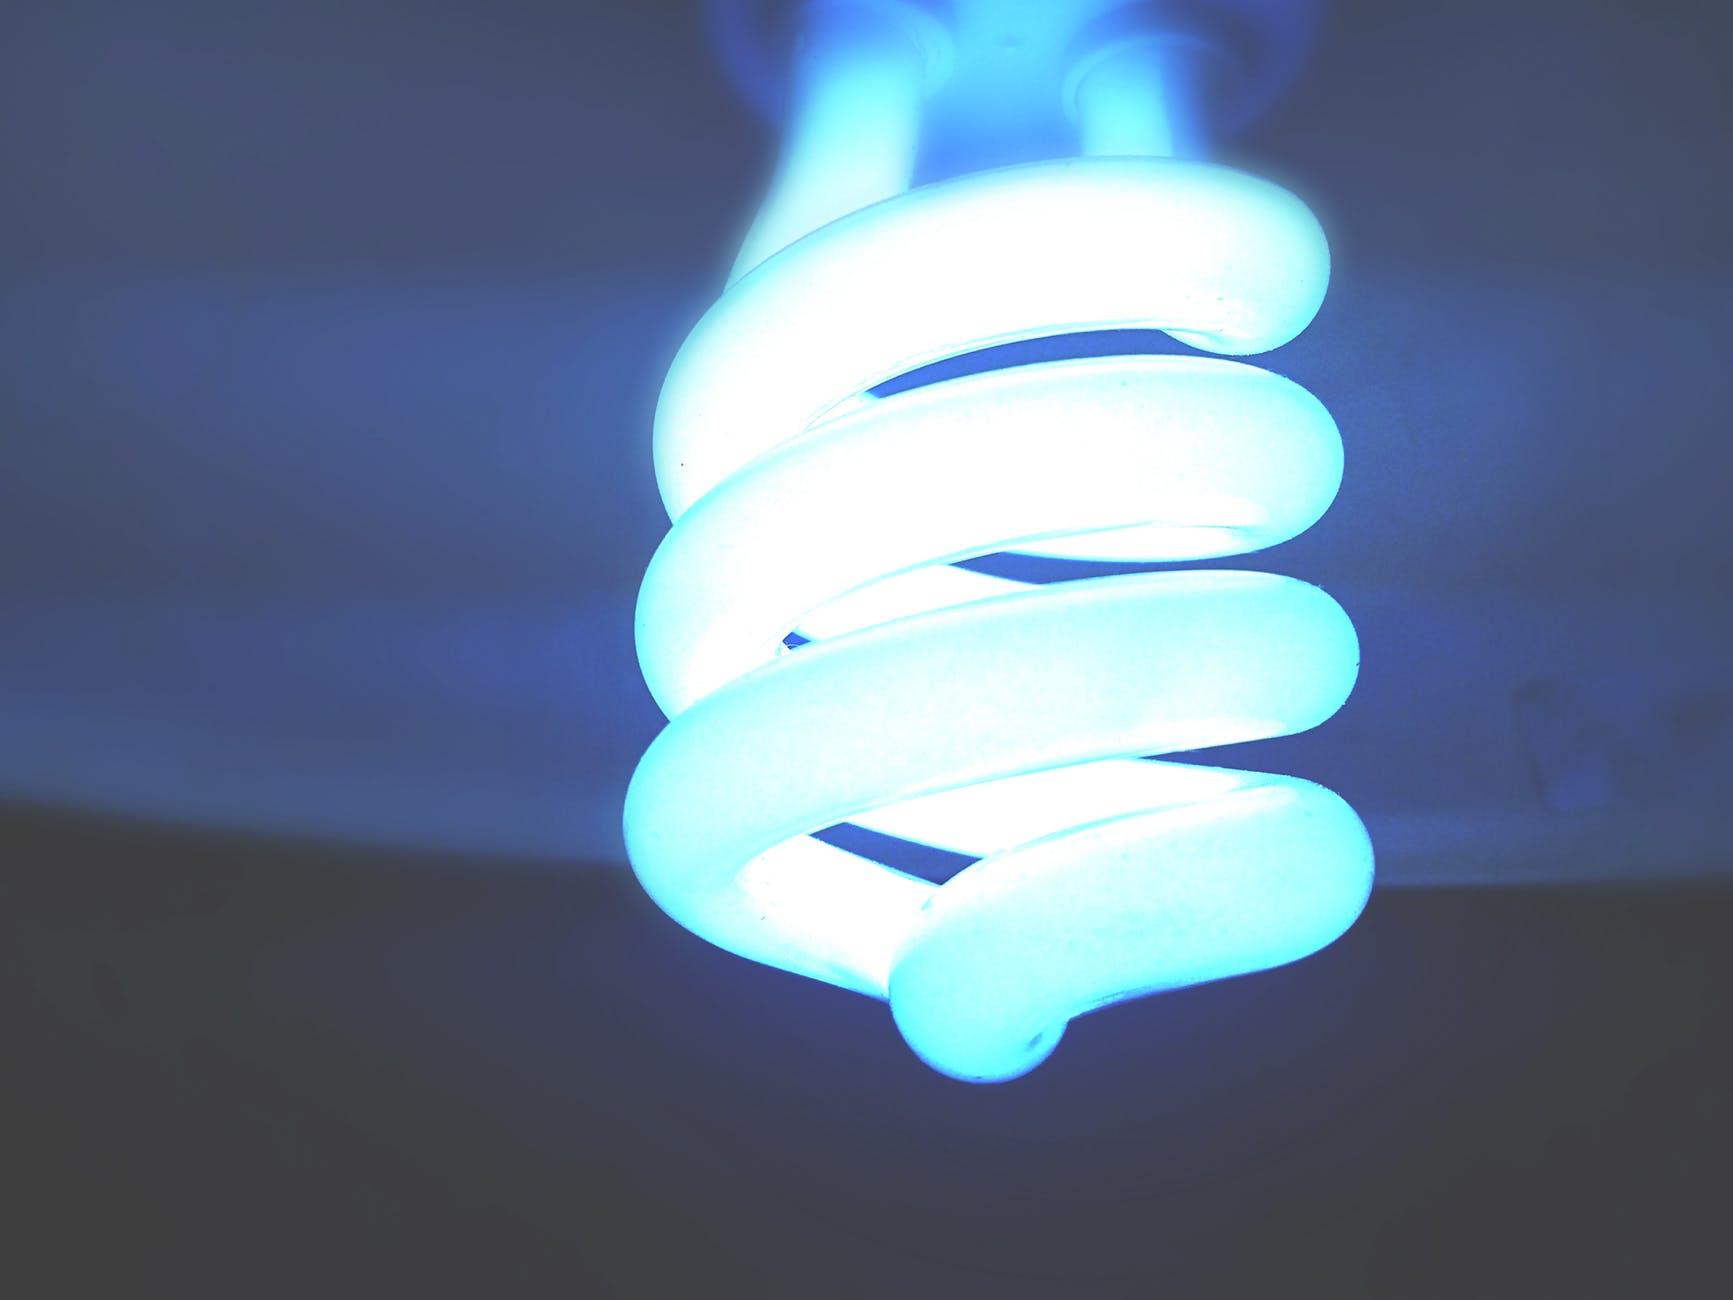 abstract blur bright bulb